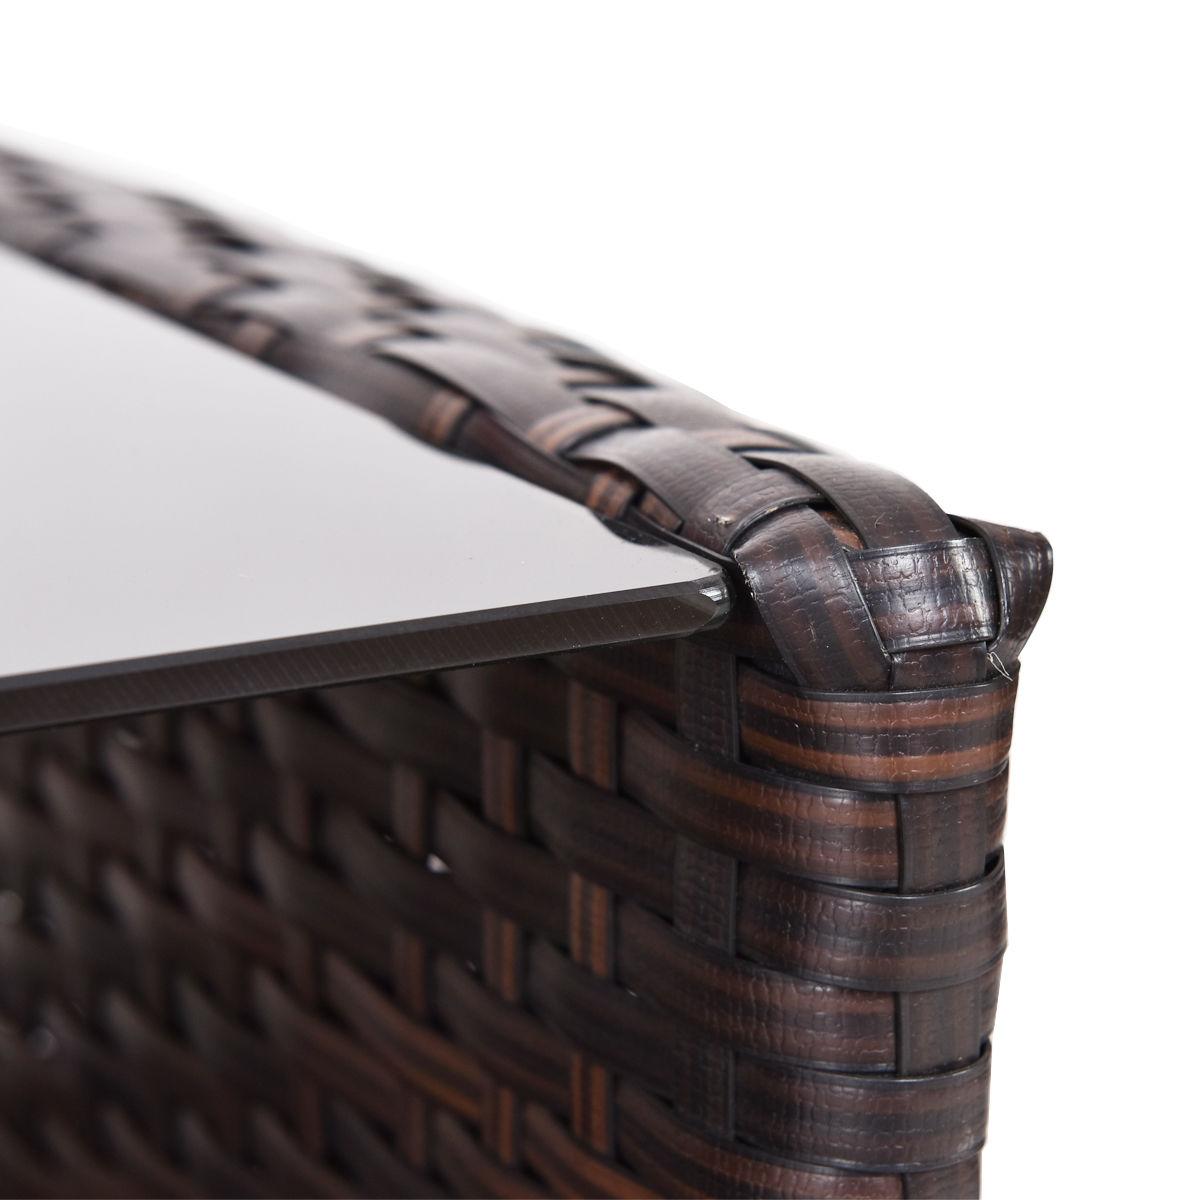 4 pcs Outdoor Patio Rattan Furniture Set Table Shelf Sofa